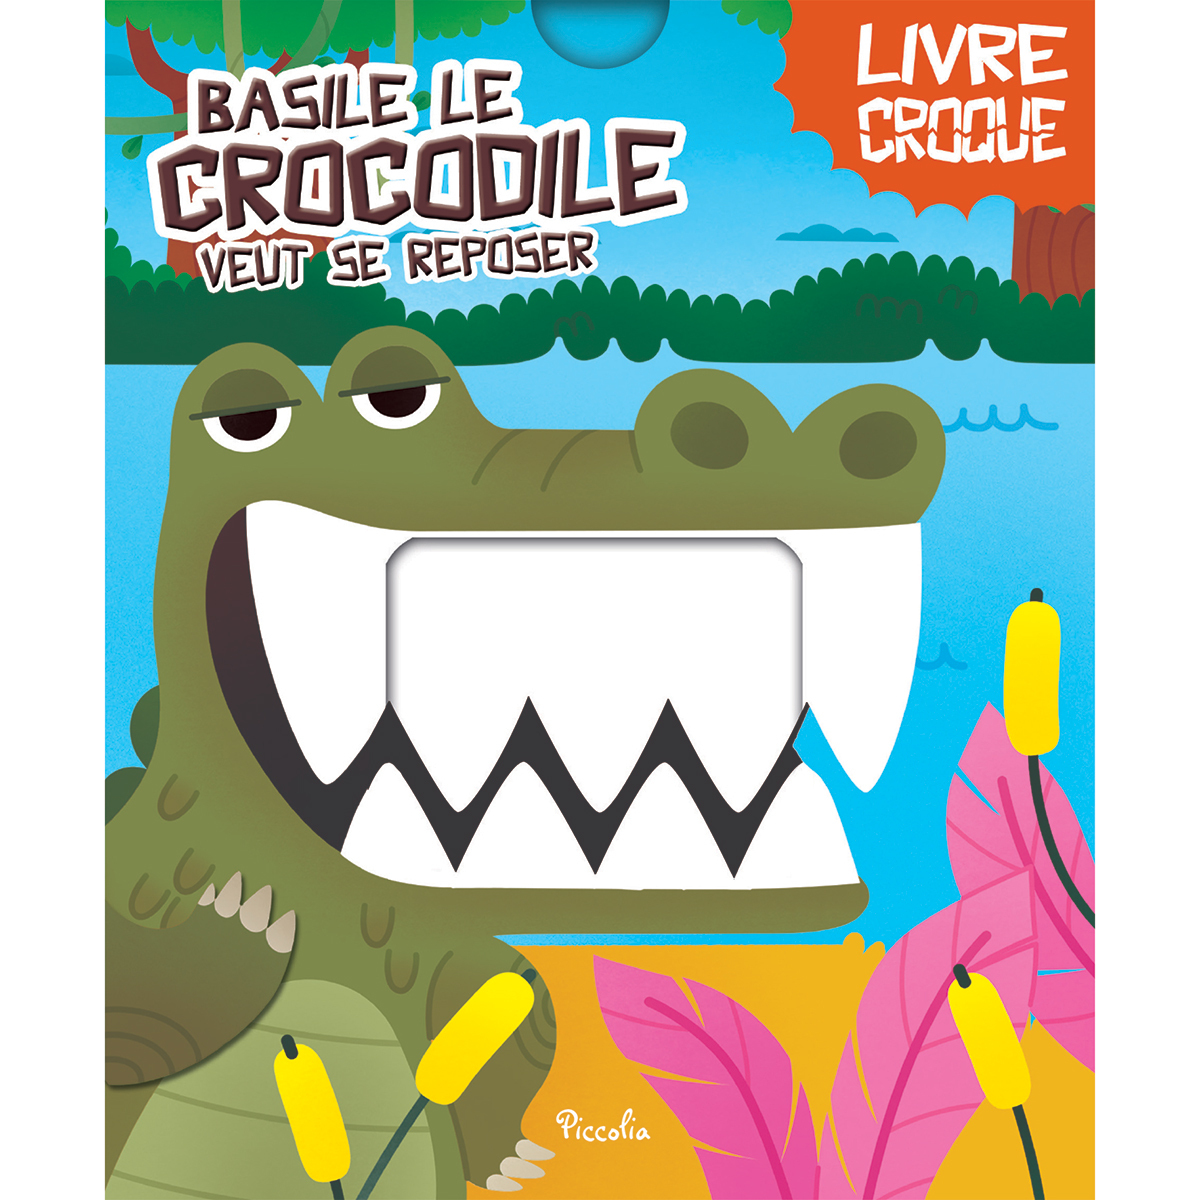 Livre & Carte Basile le Crocodile veut se Reposer Basile le Crocodile veut se Reposer